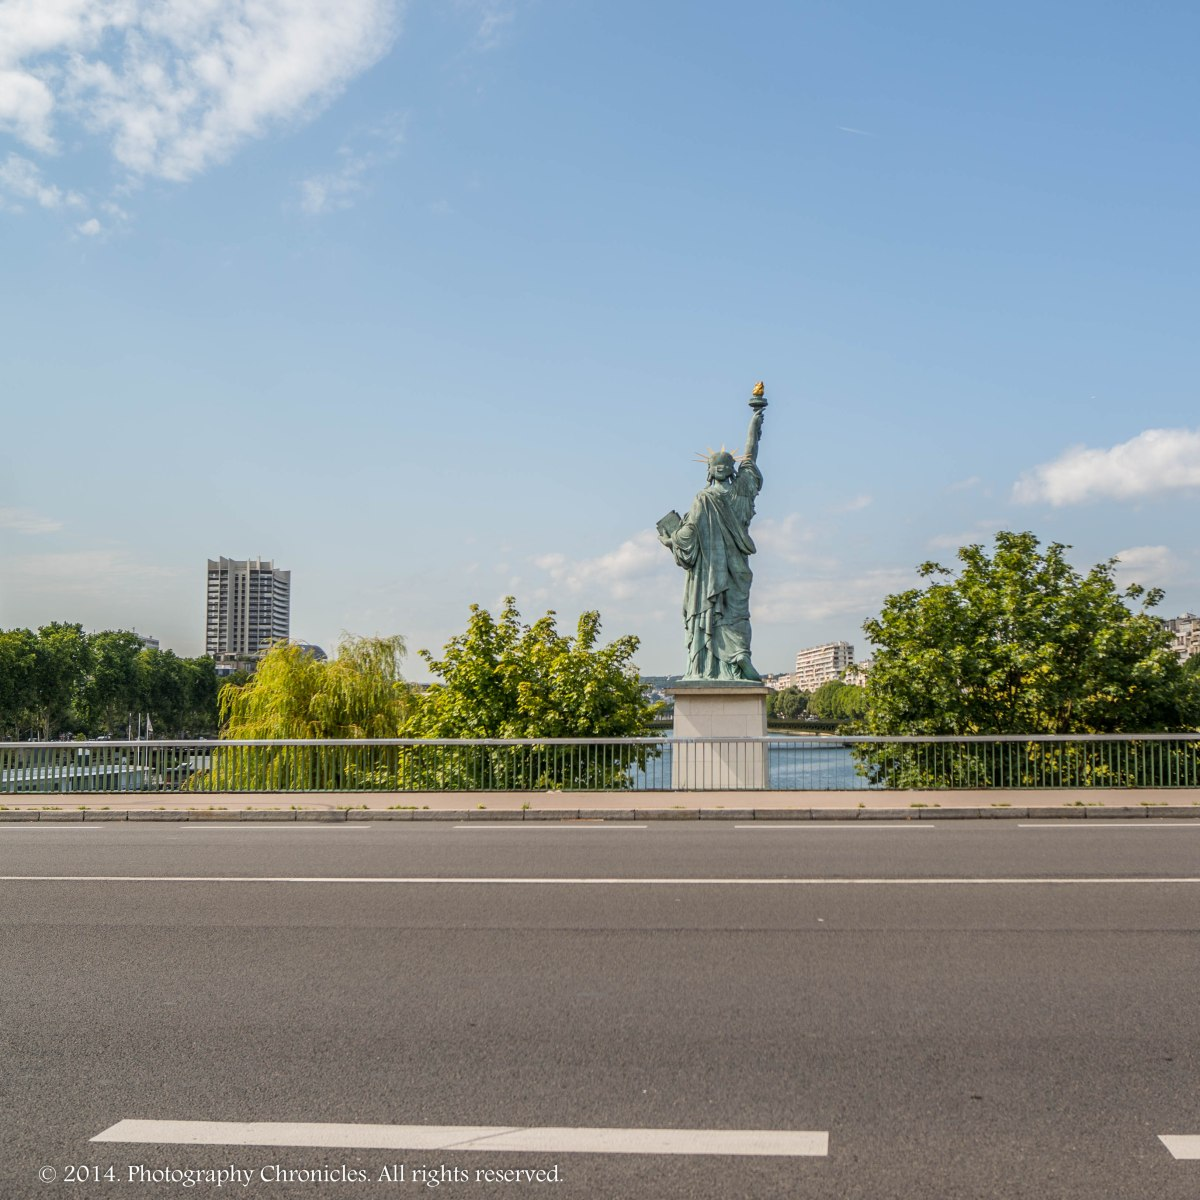 Statue of Liberty Paris variation 5